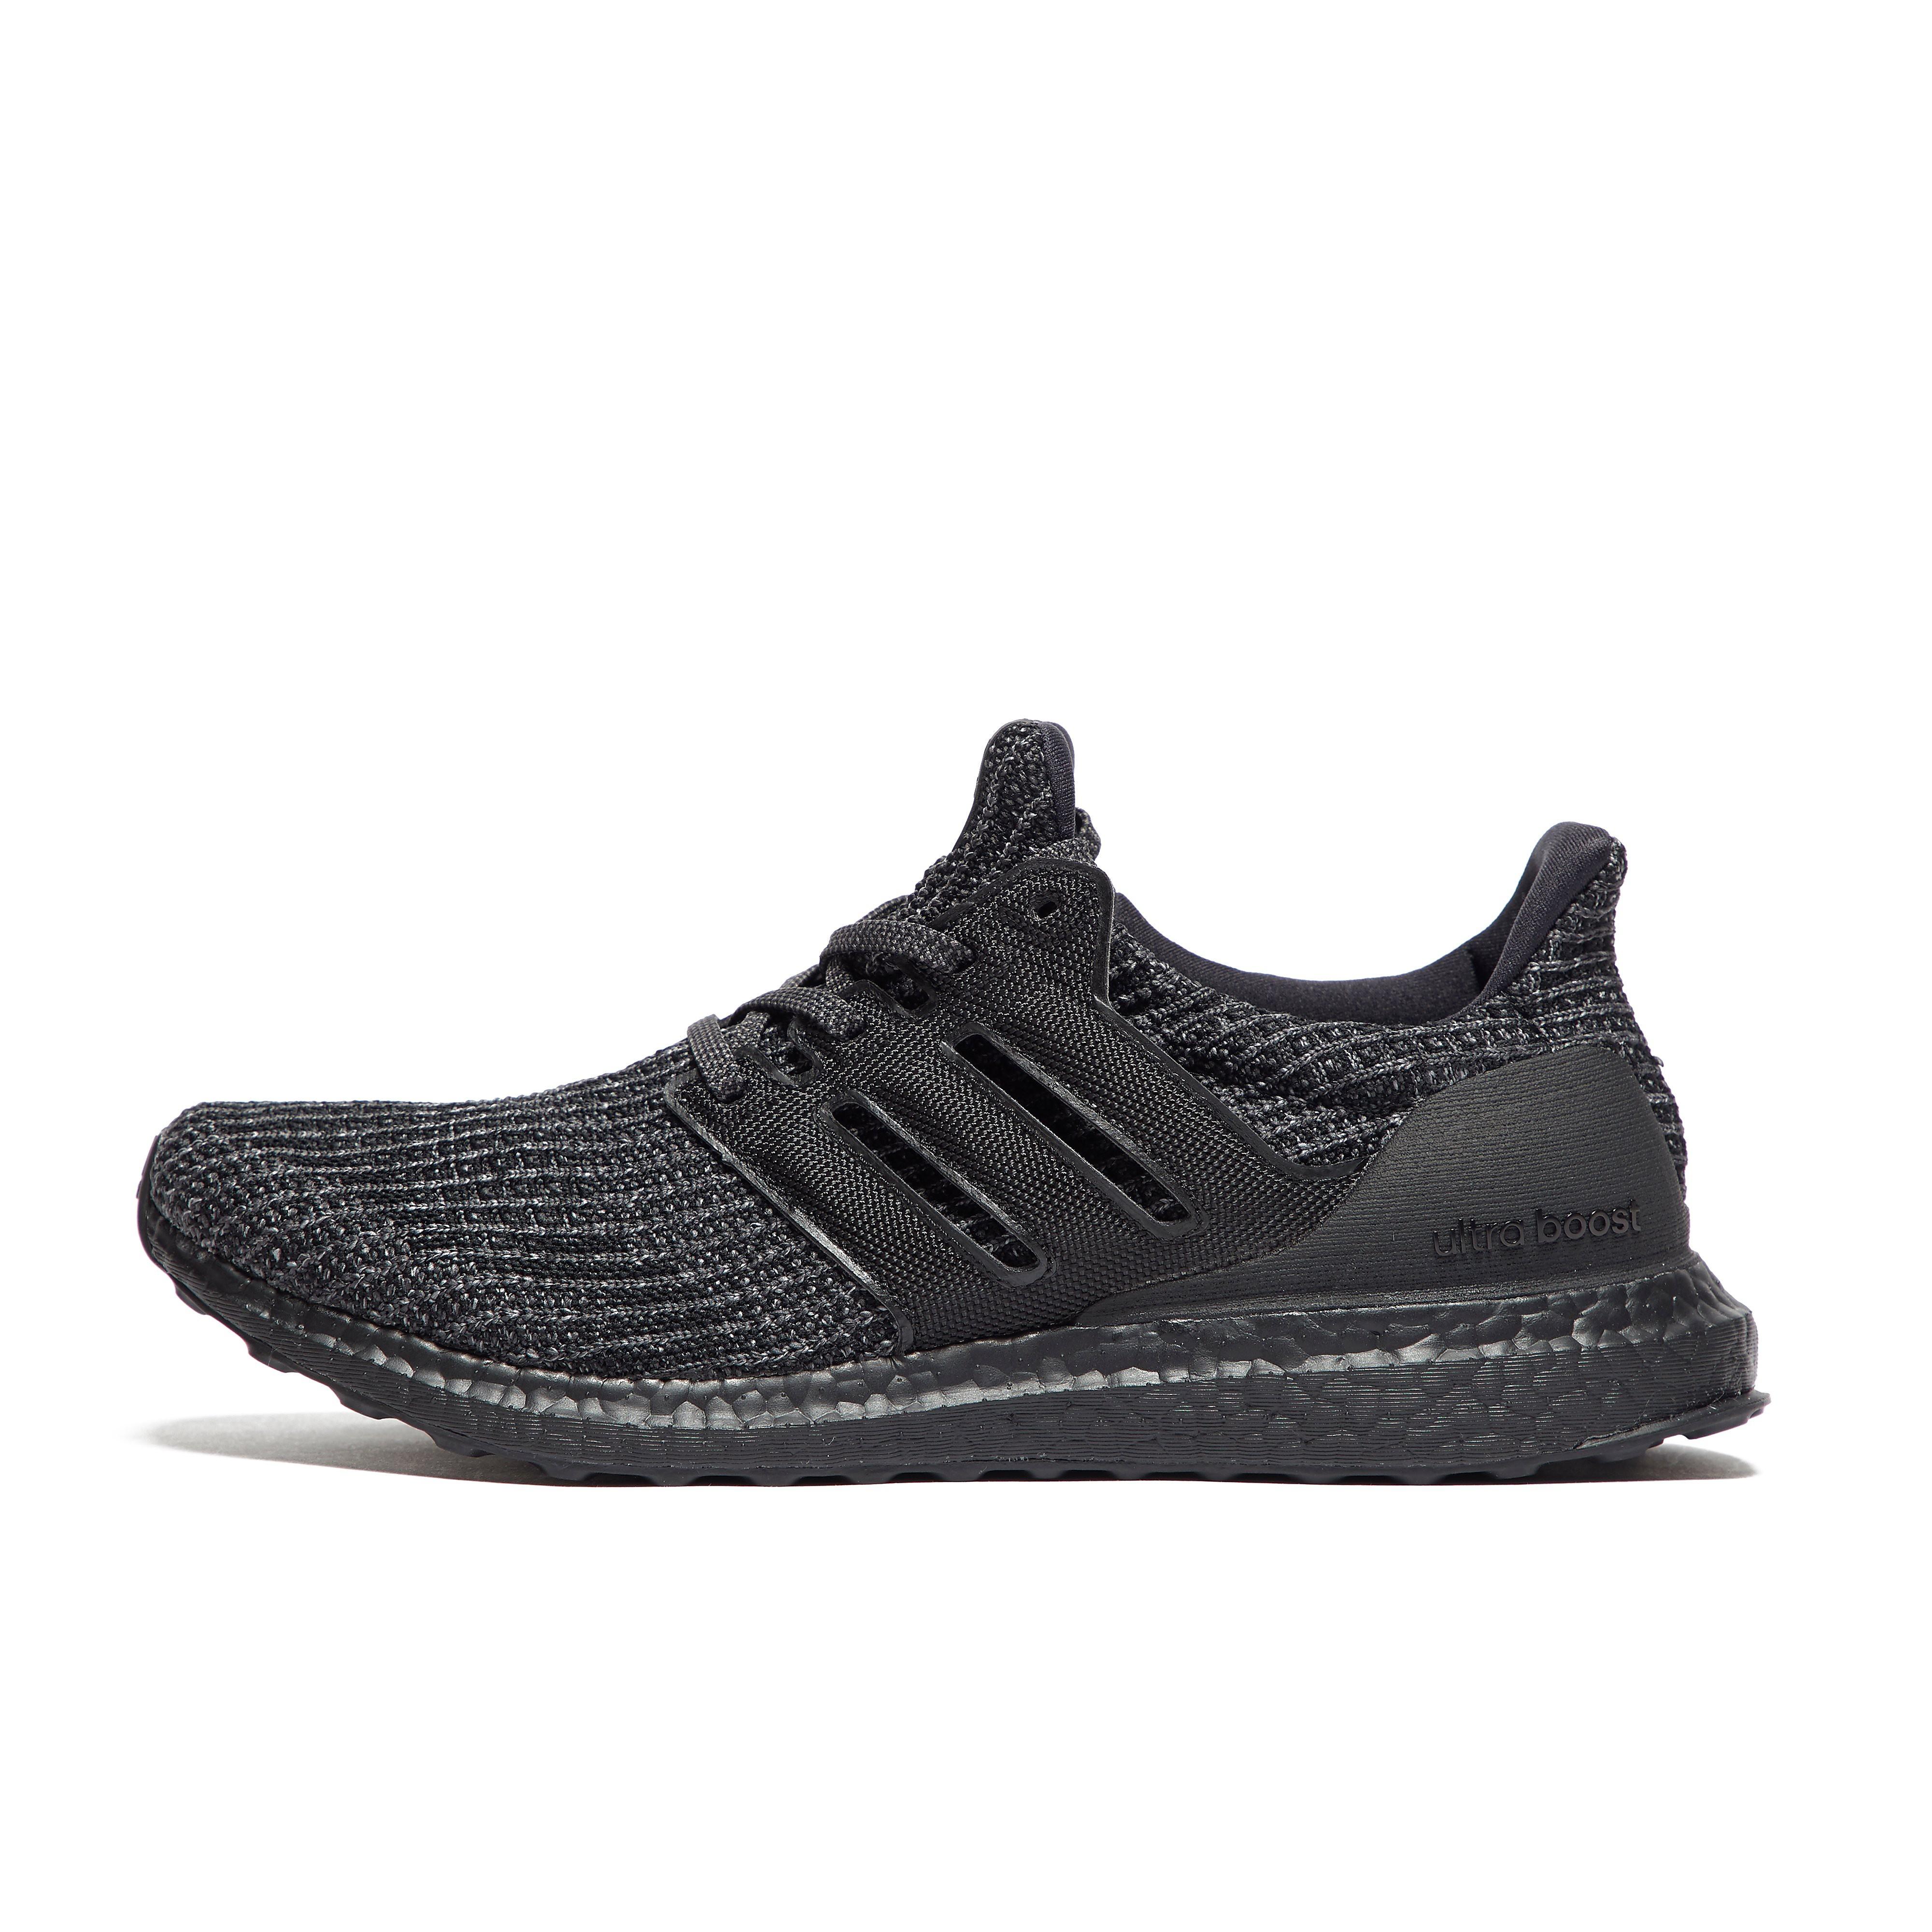 Mens Black adidas Ultraboost Running Shoes